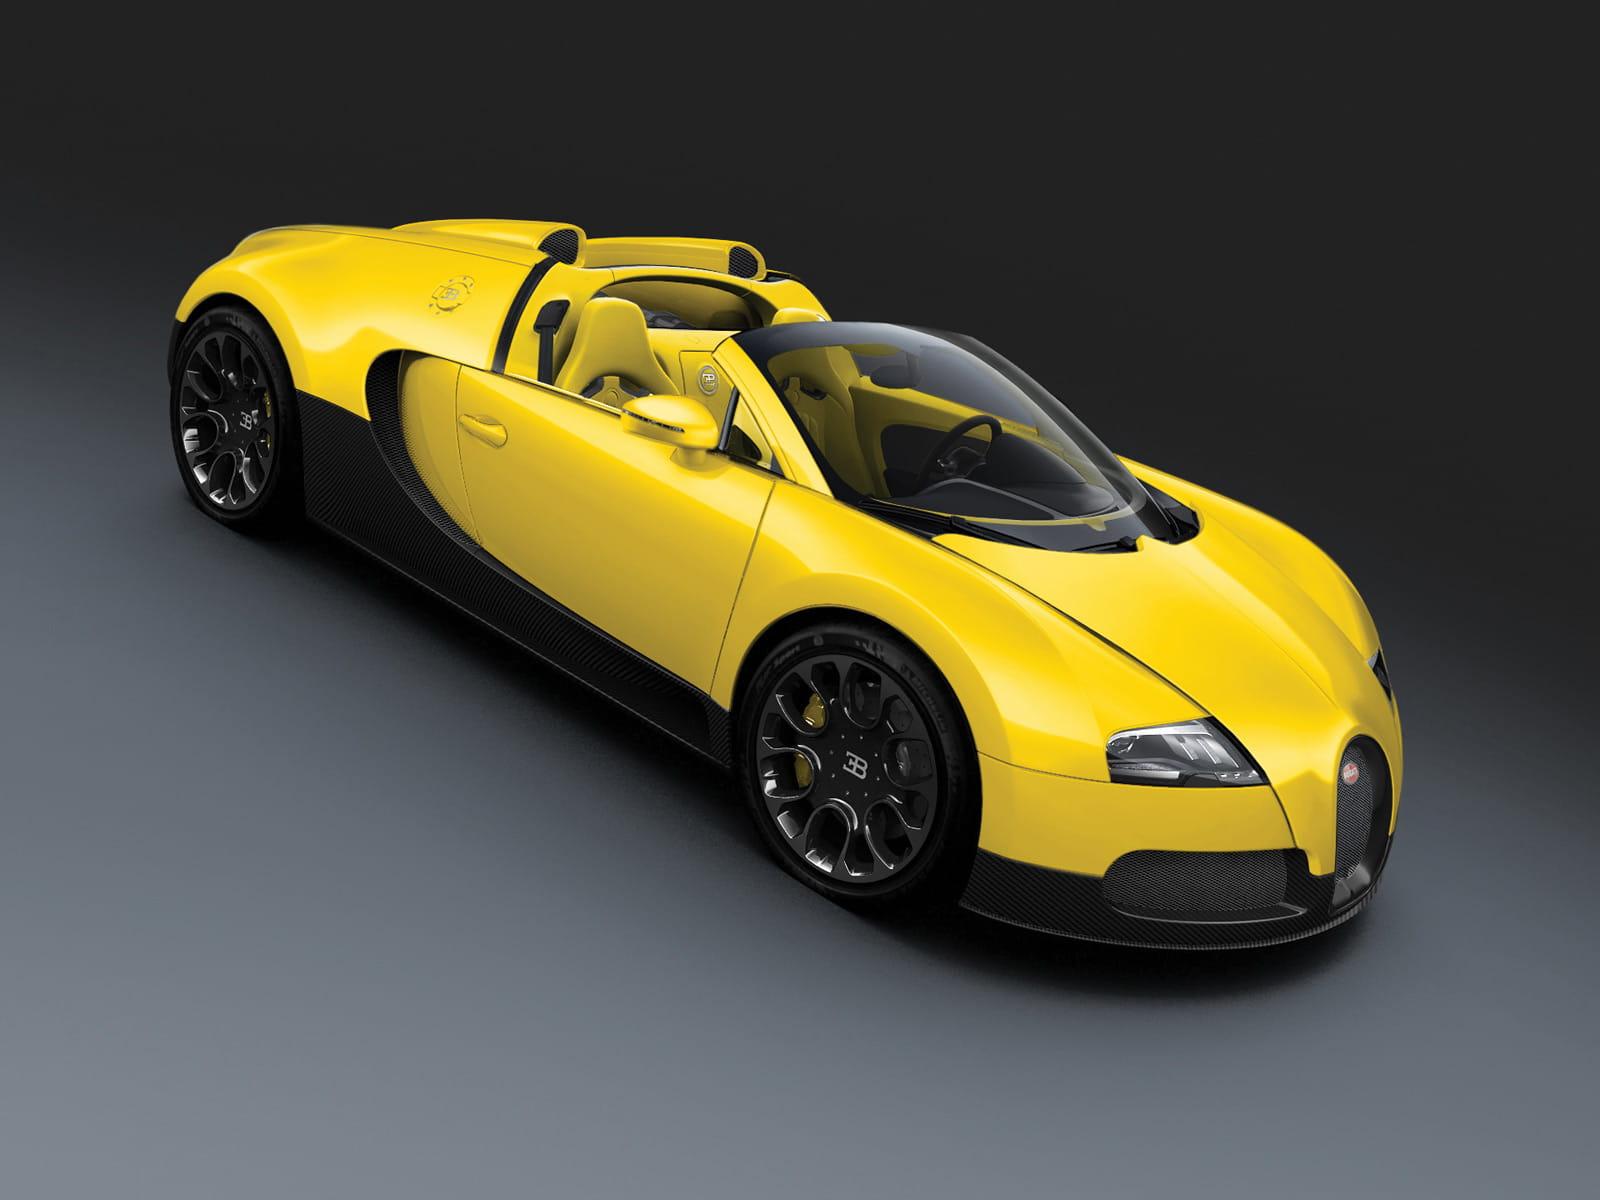 bugatti-veyron-grand-sport-dubai-01 Remarkable Bugatti Veyron Grand Sport Vitesse Informacion Cars Trend